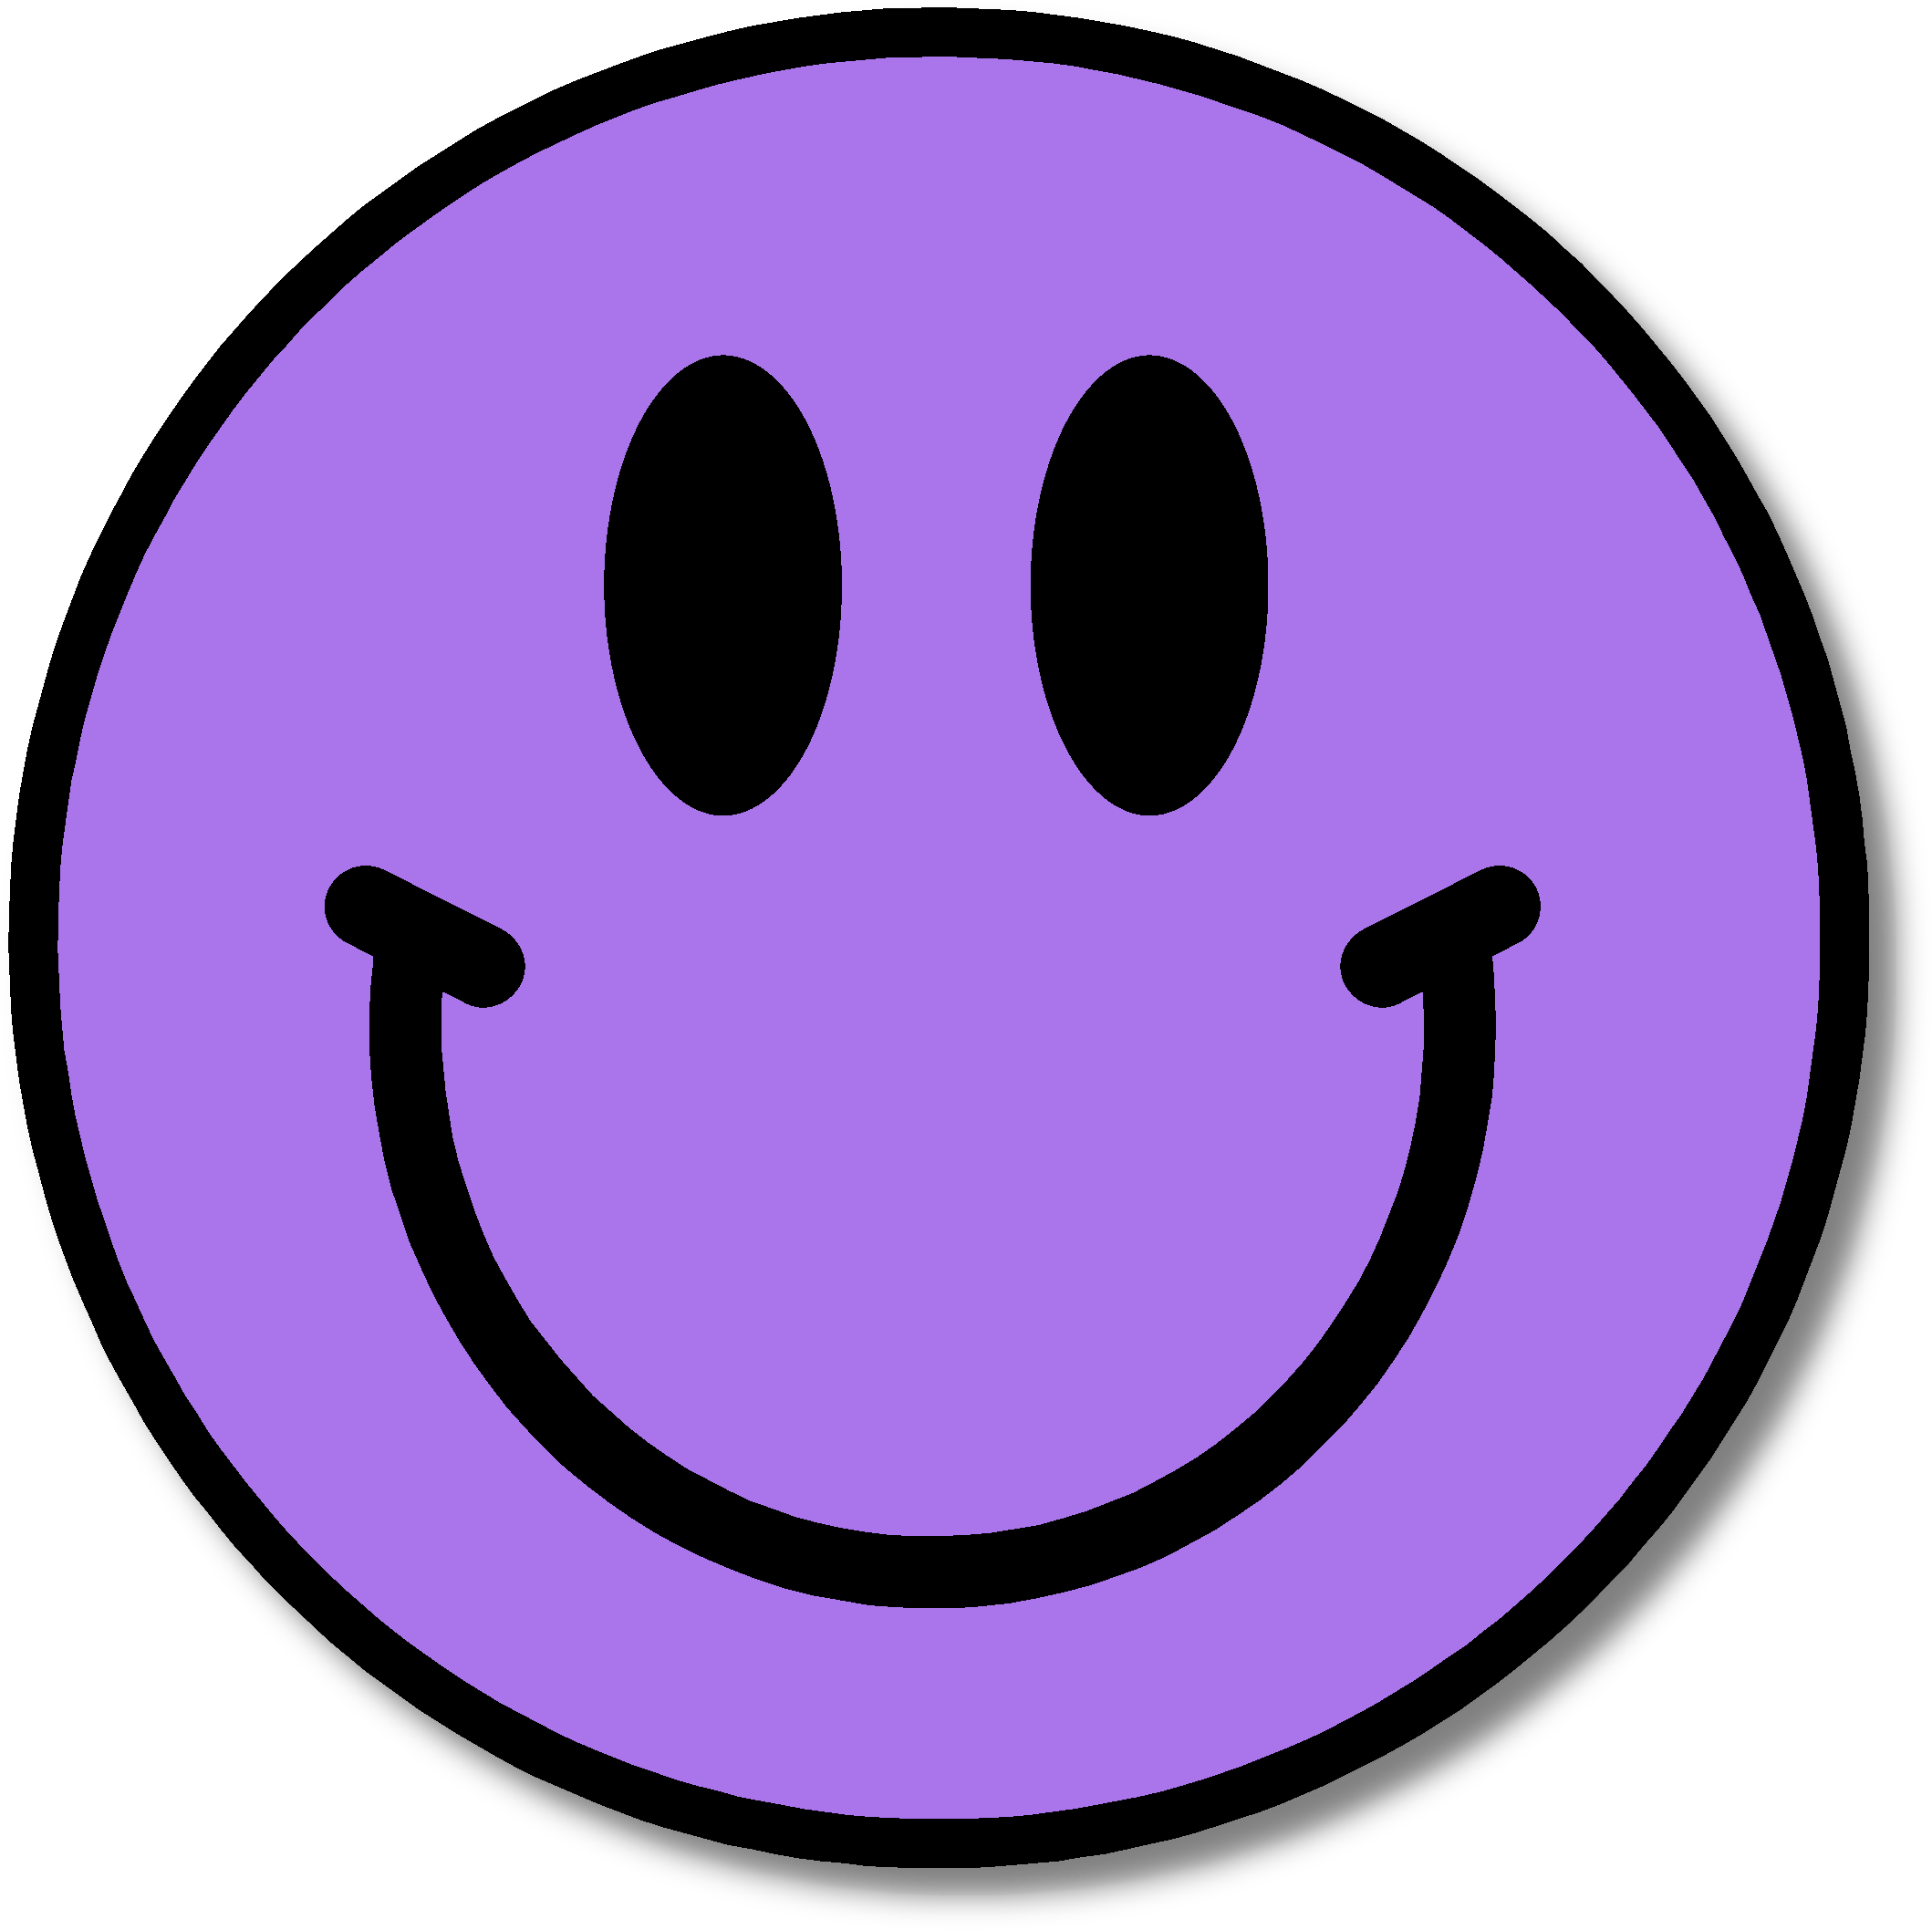 095a3401097a53a01ada7d3d62abd714 purple happy face free clipart for rh pinterest com Funny Smiley Face Clip Art Funny Smiley Face Clip Art